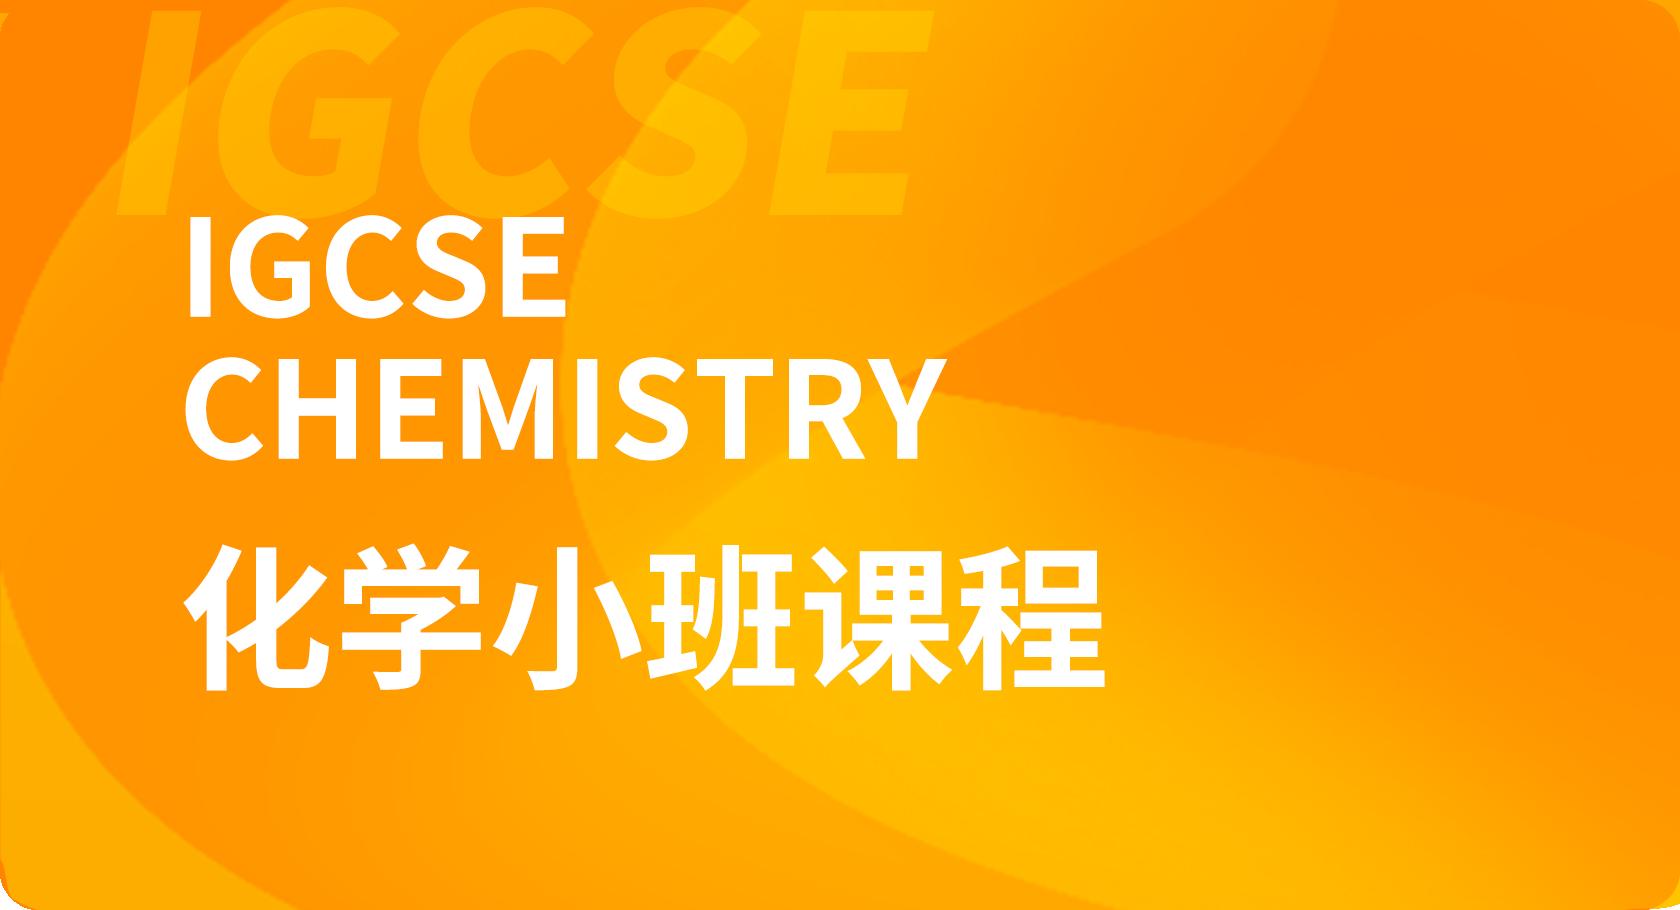 IGCSE化学小班课程